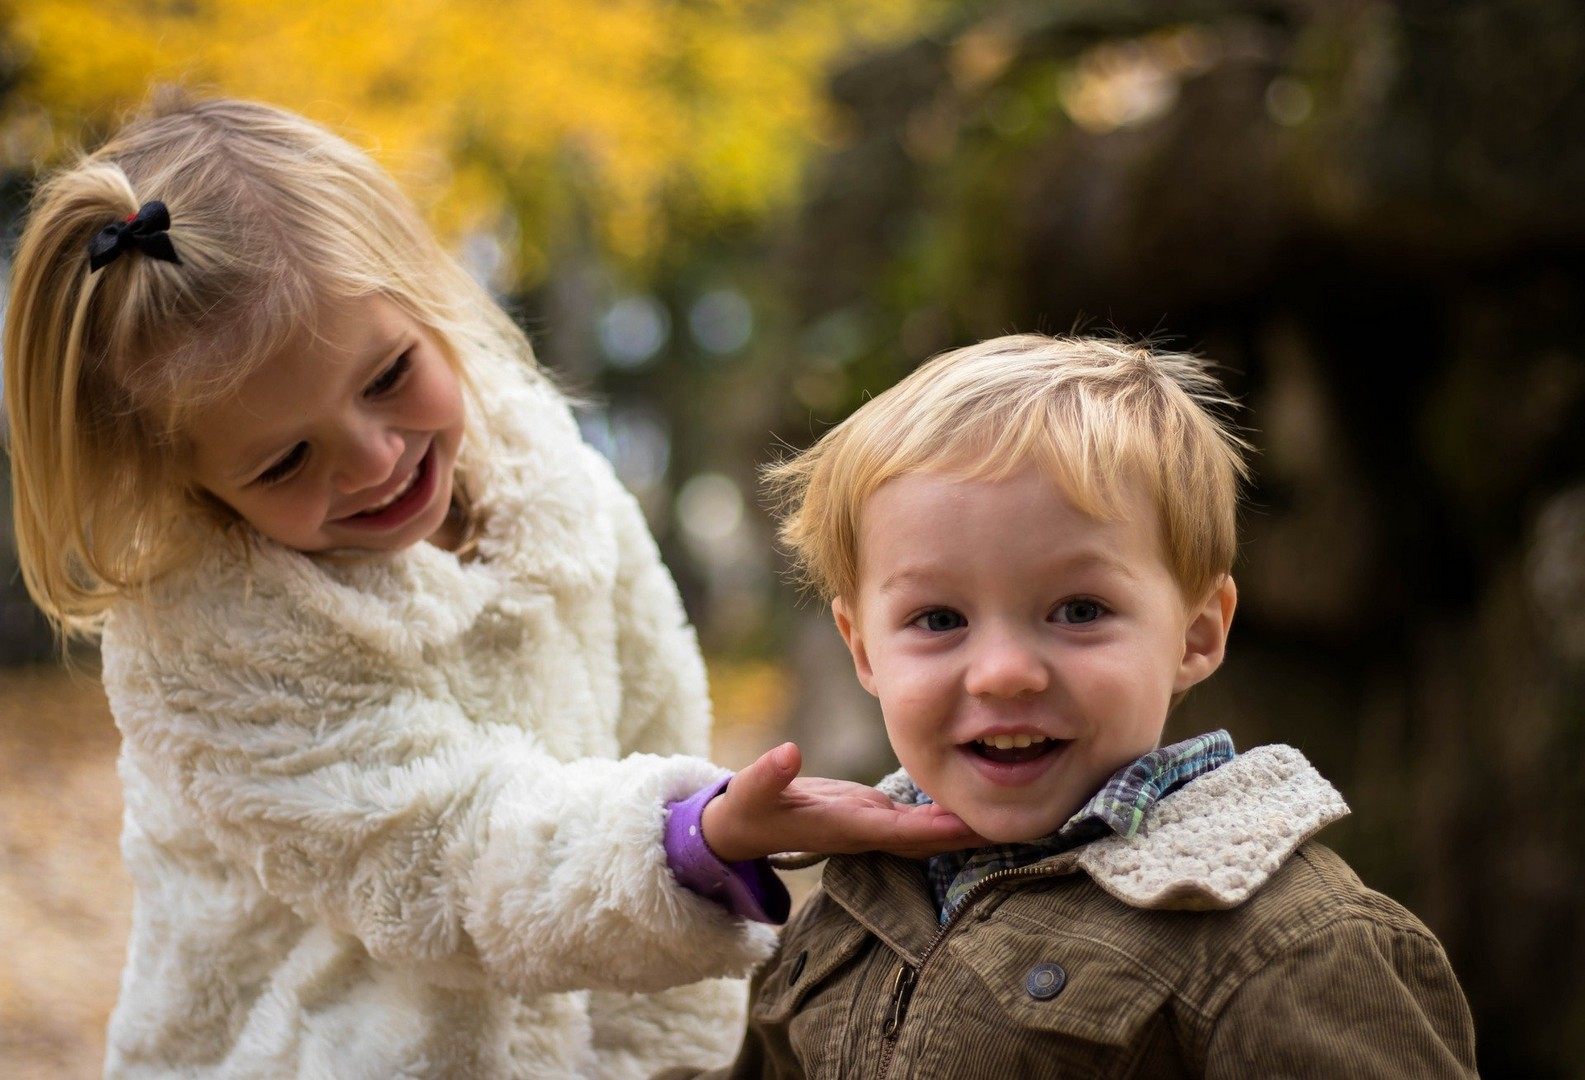 Развод с маленьким ребенком до года: права отца и матери от нашего юриста